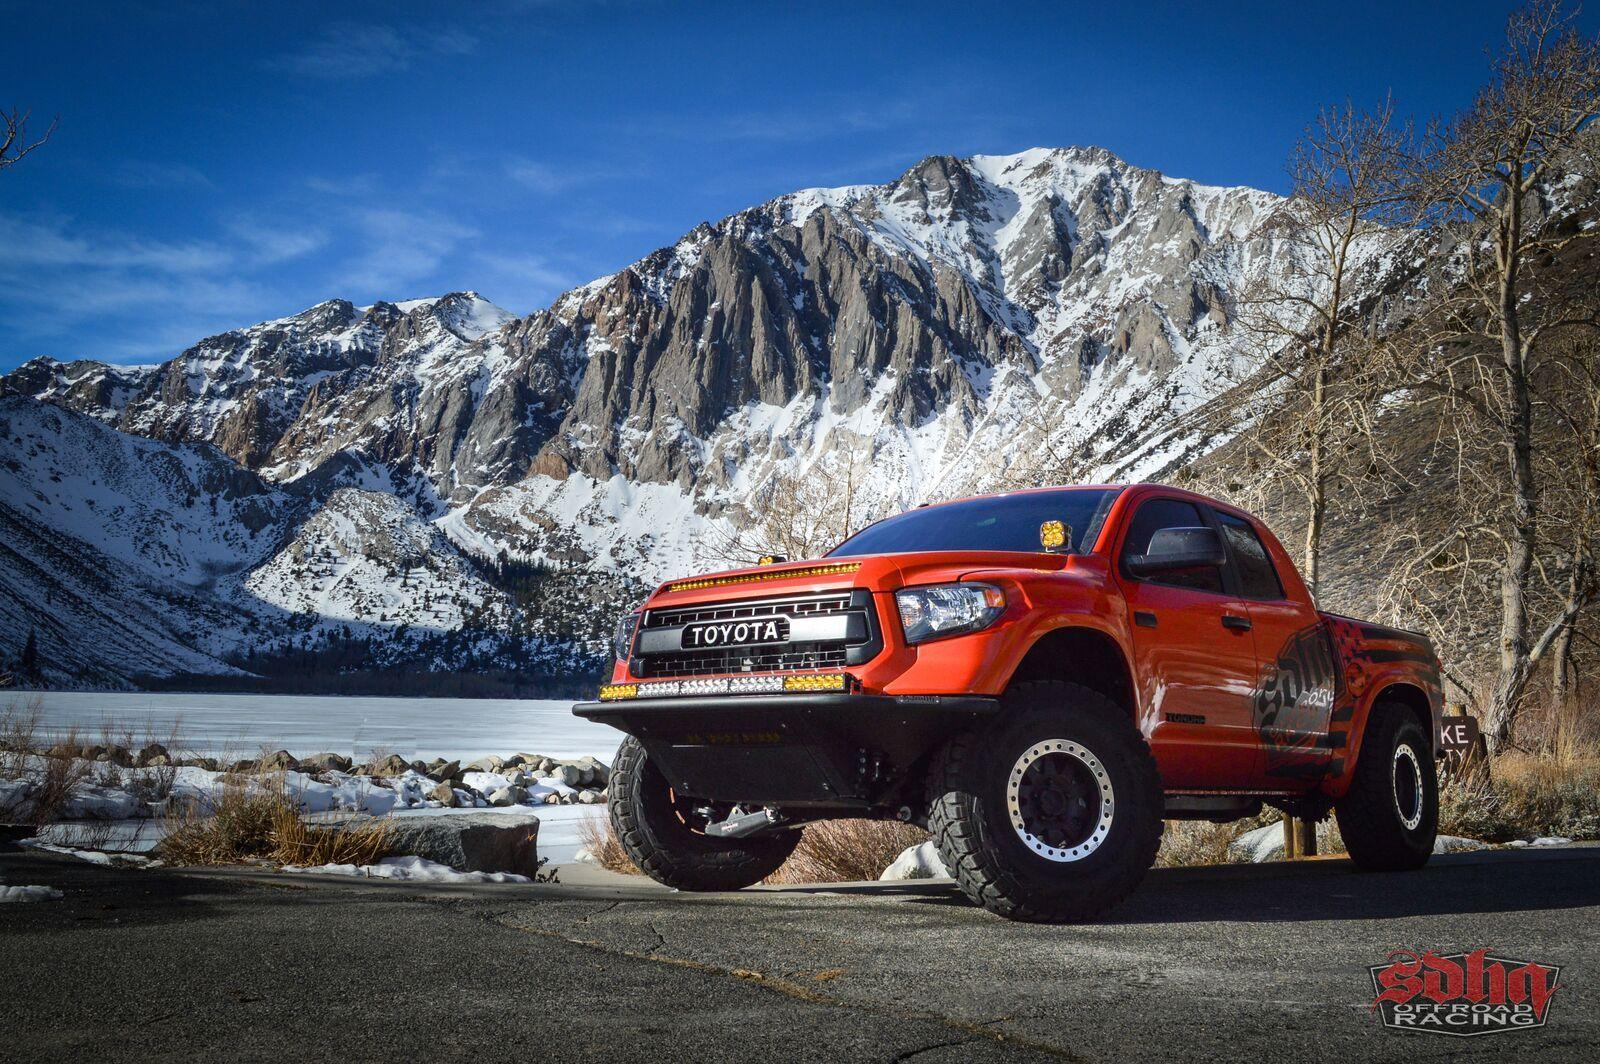 SDHQ Tundra TRD Pro Tundra trd, Tundra trd pro, Toyota